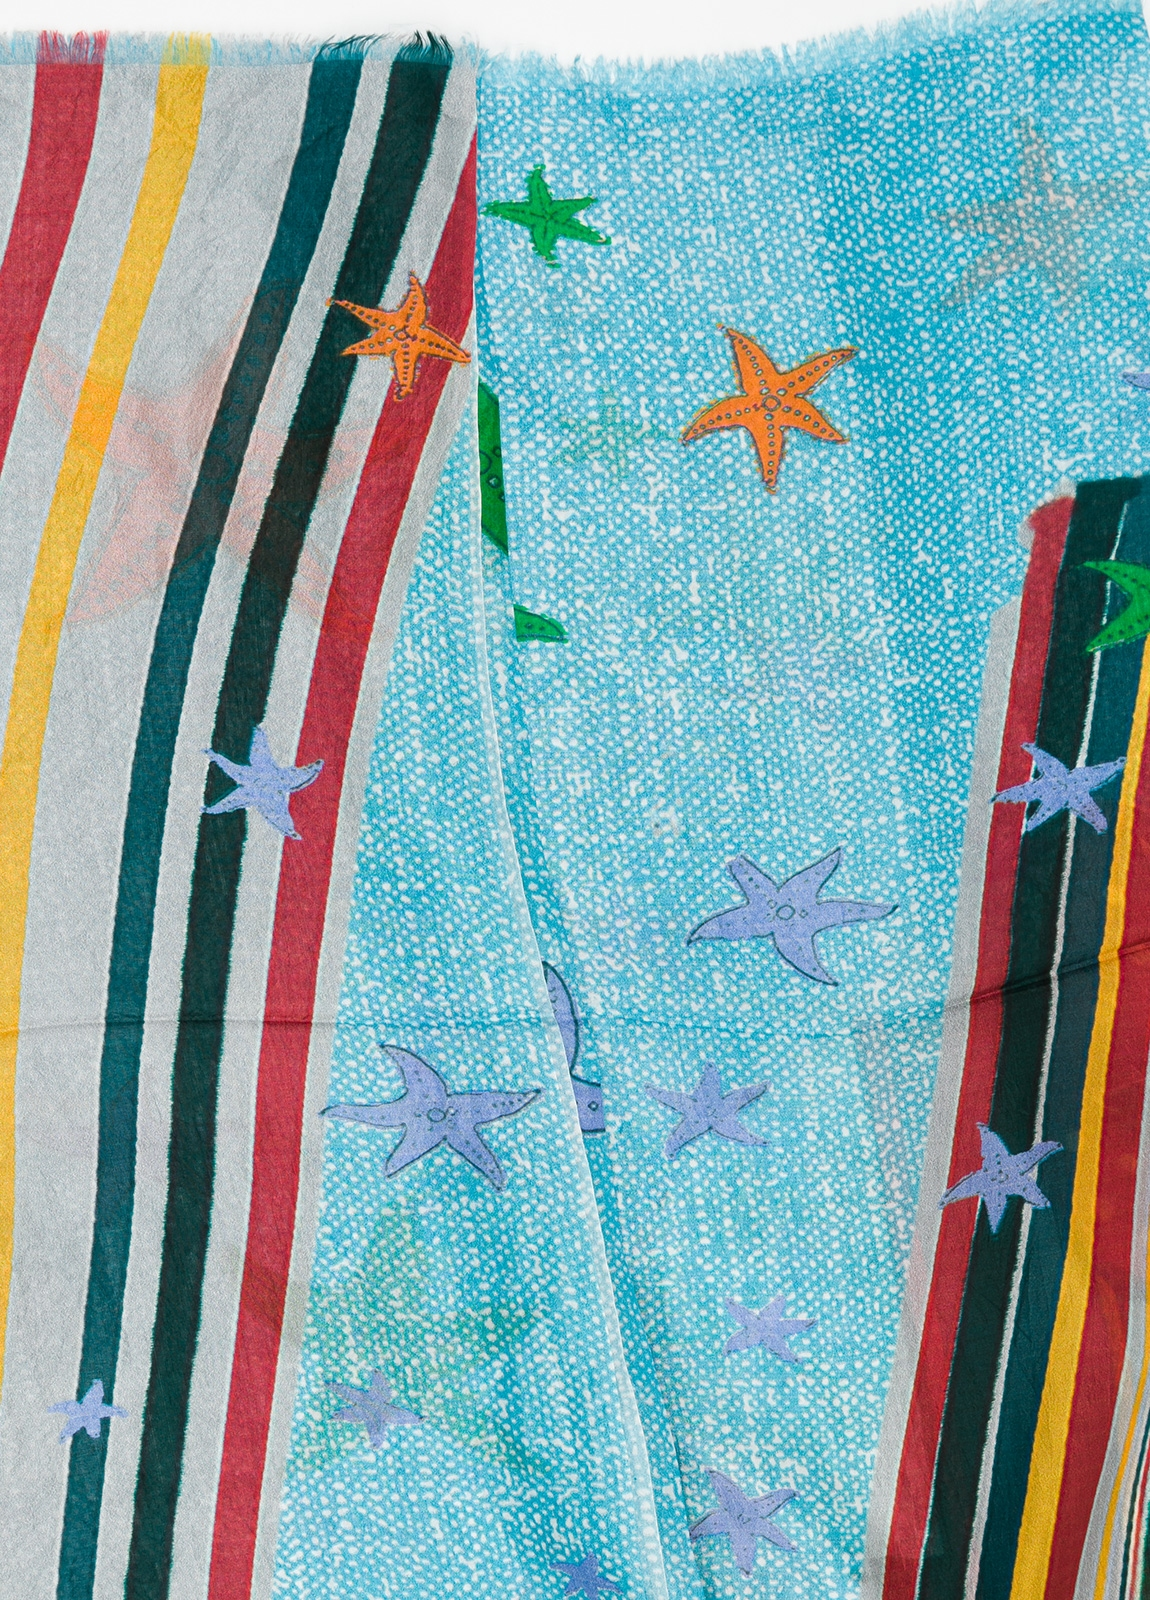 Foulard estampado estrellas color turquesa 100 x 200 cm. 100% Seda. - Ítem1